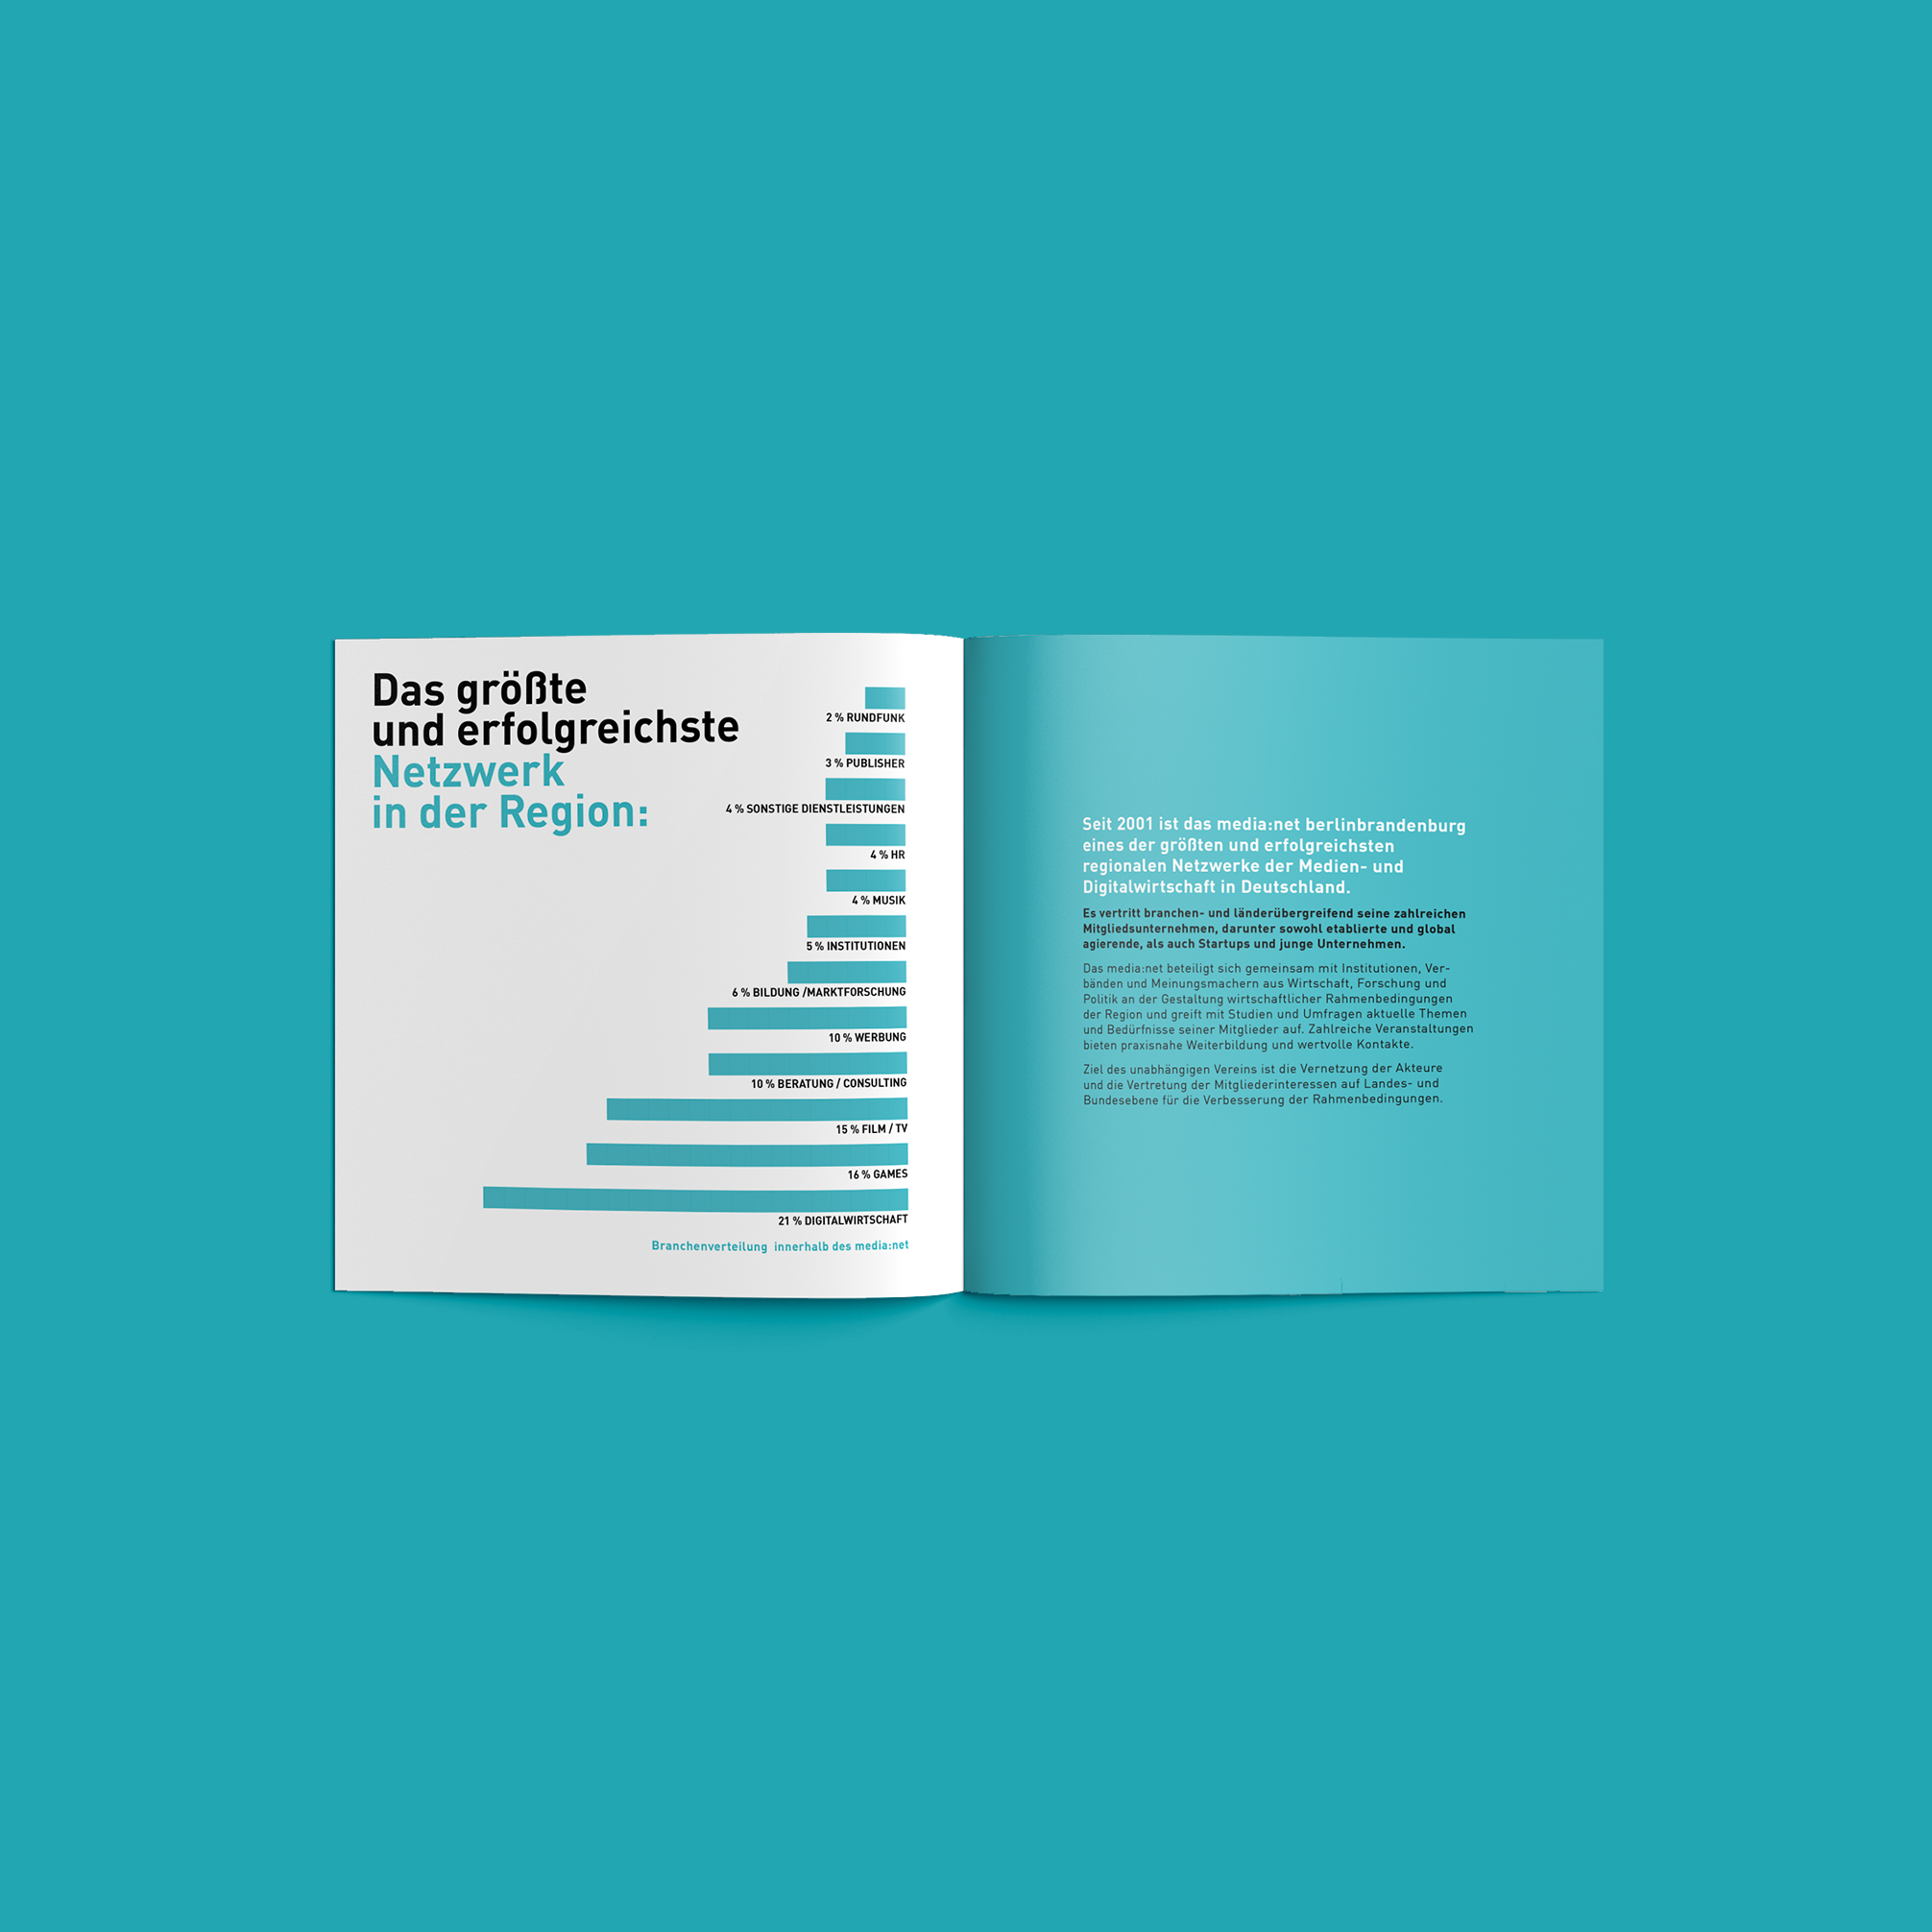 Media net berlinbrandenburg Image Broschüre - Region   Corporate Redesign